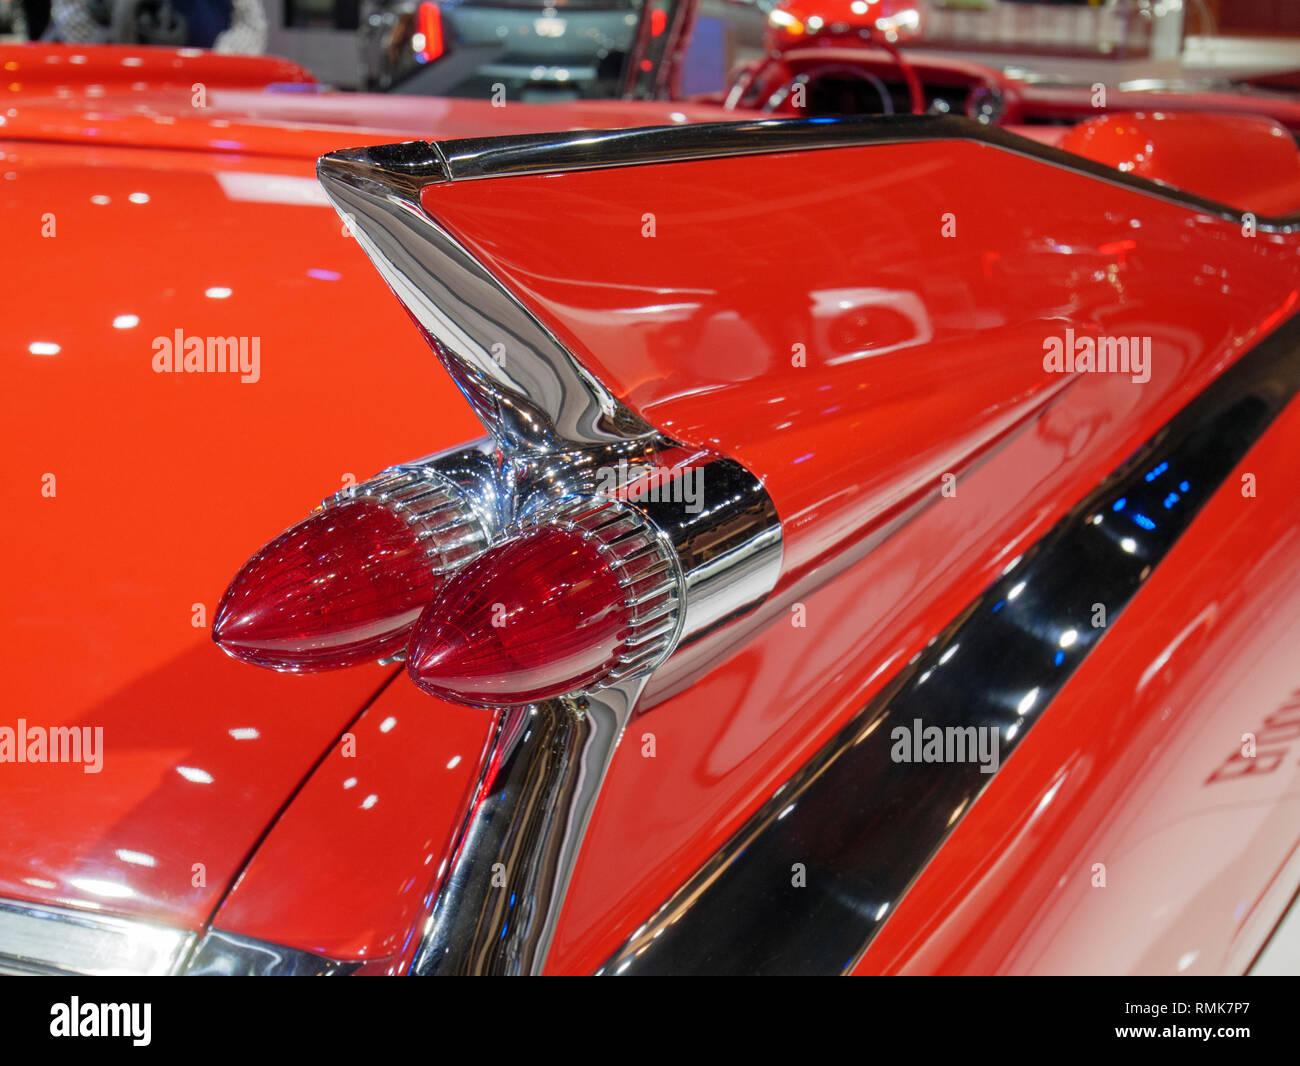 1959 Cadillac Eldorado Biarritz Convertible tail fin and tail lights. 2019 Chicago Auto Show. Stock Photo